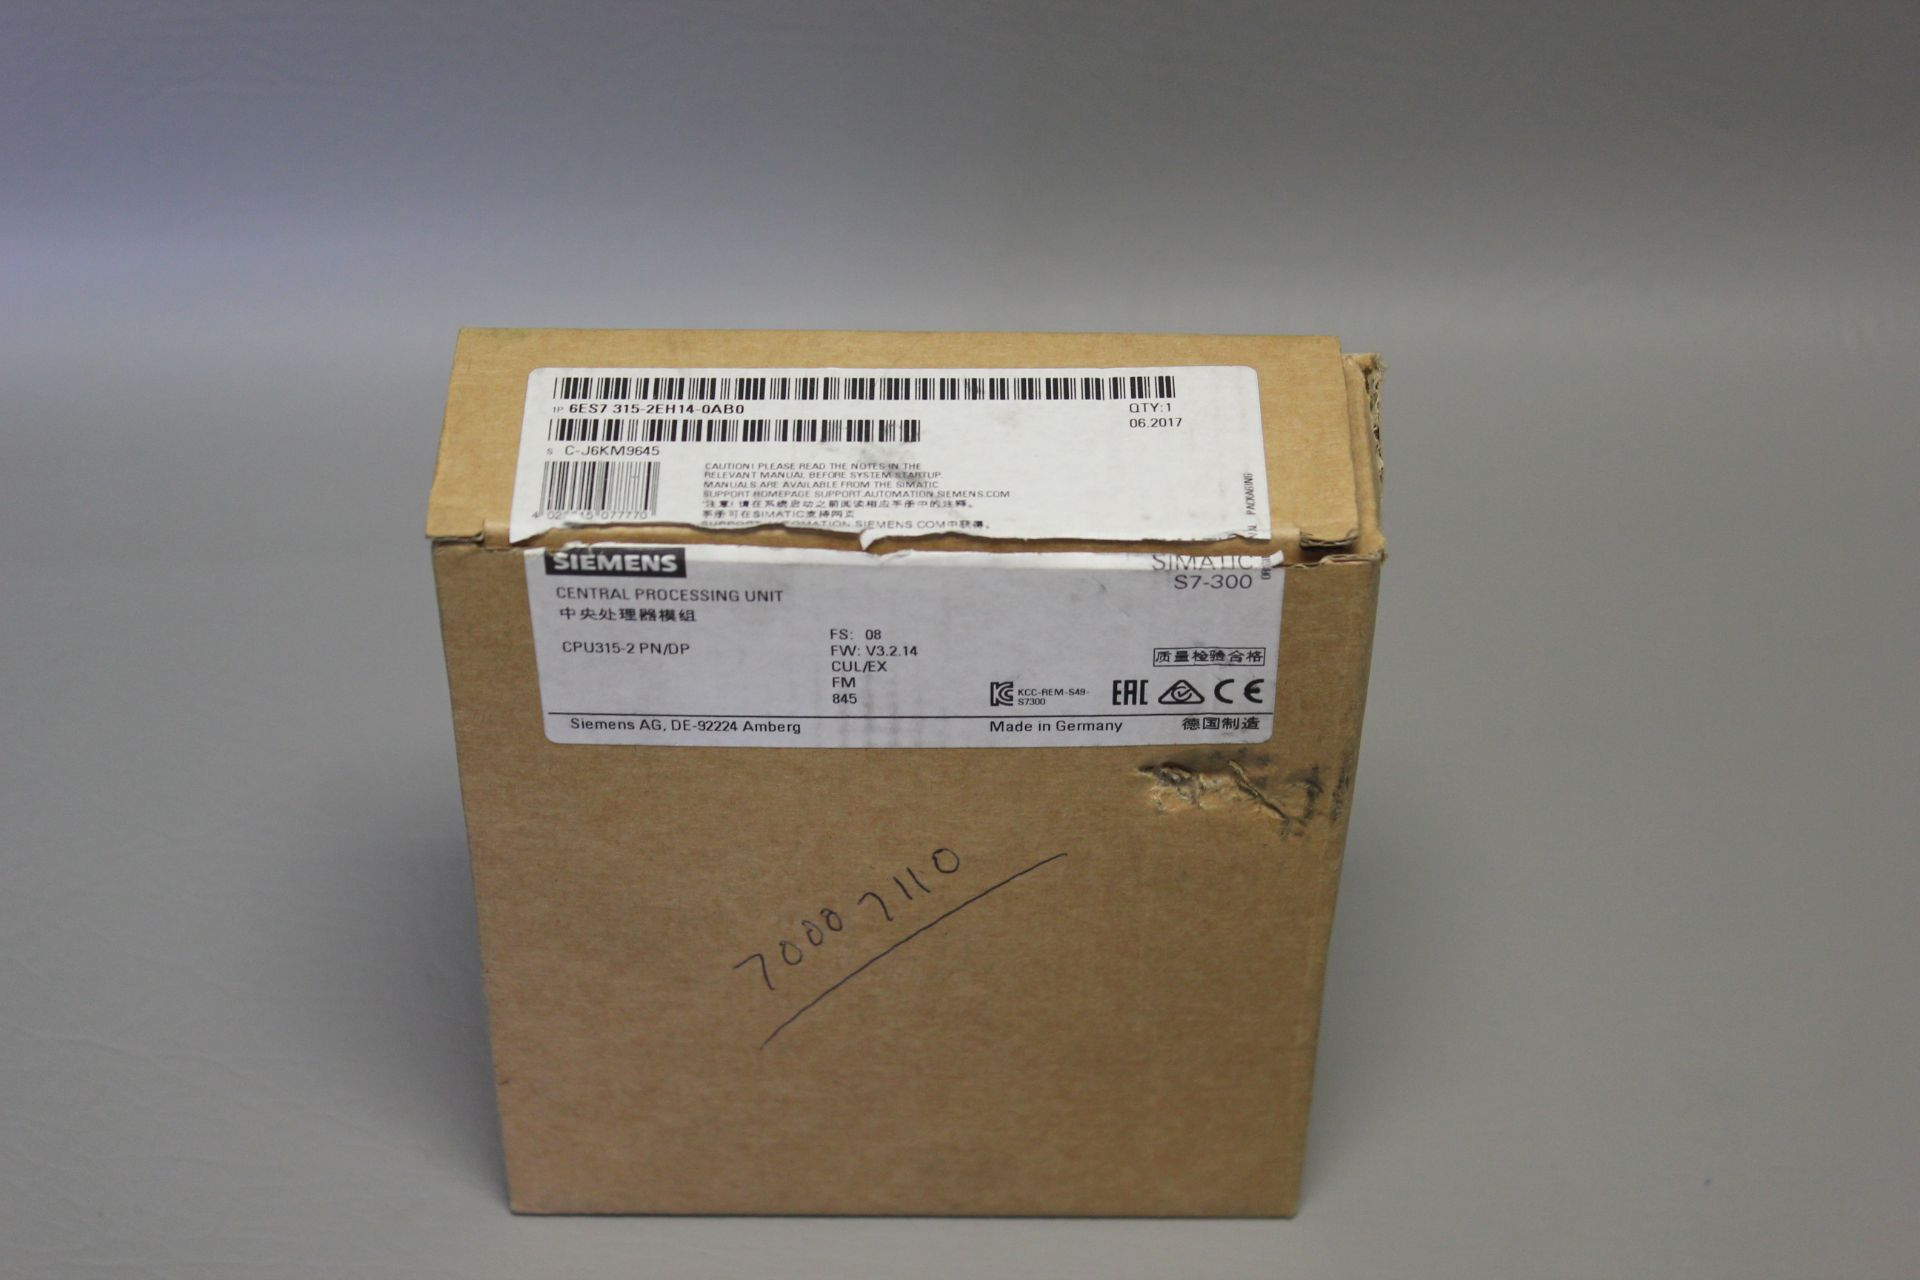 NEW SIEMENS SIMATIC S7-300 PLC CPU PROCESSOR - Image 4 of 7